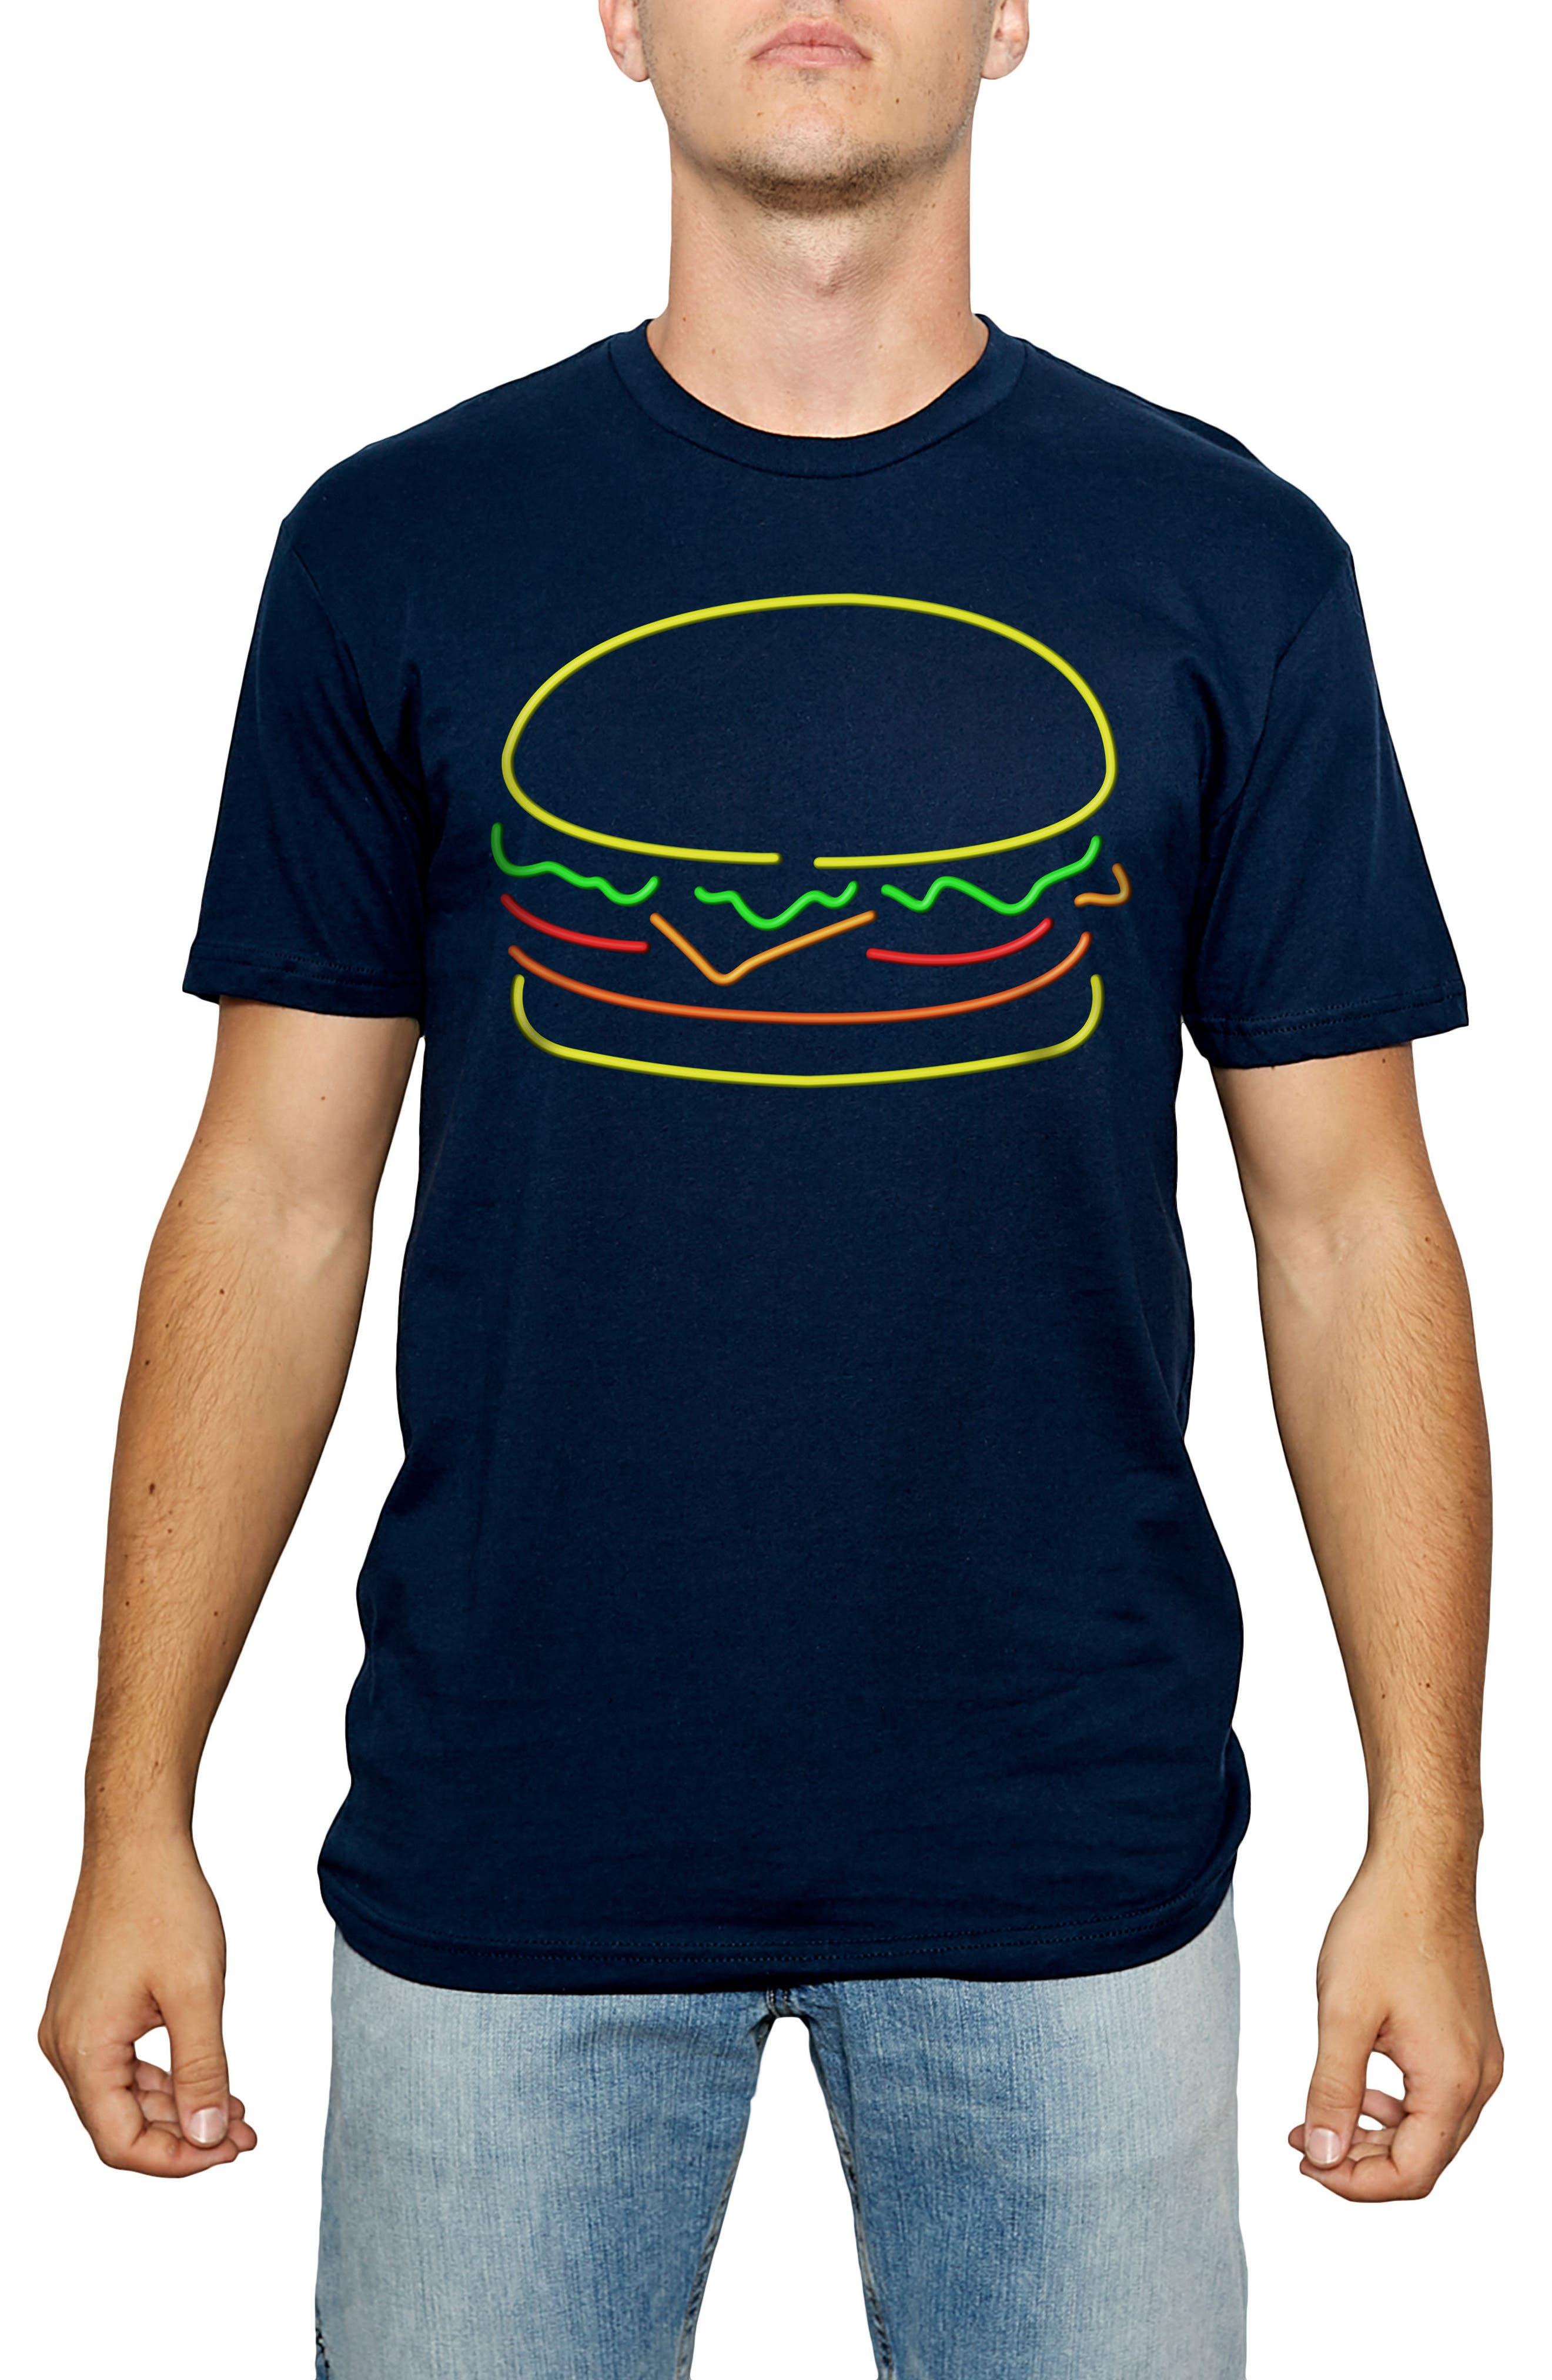 Neon Cheeseburger Graphic T-Shirt,                         Main,                         color,